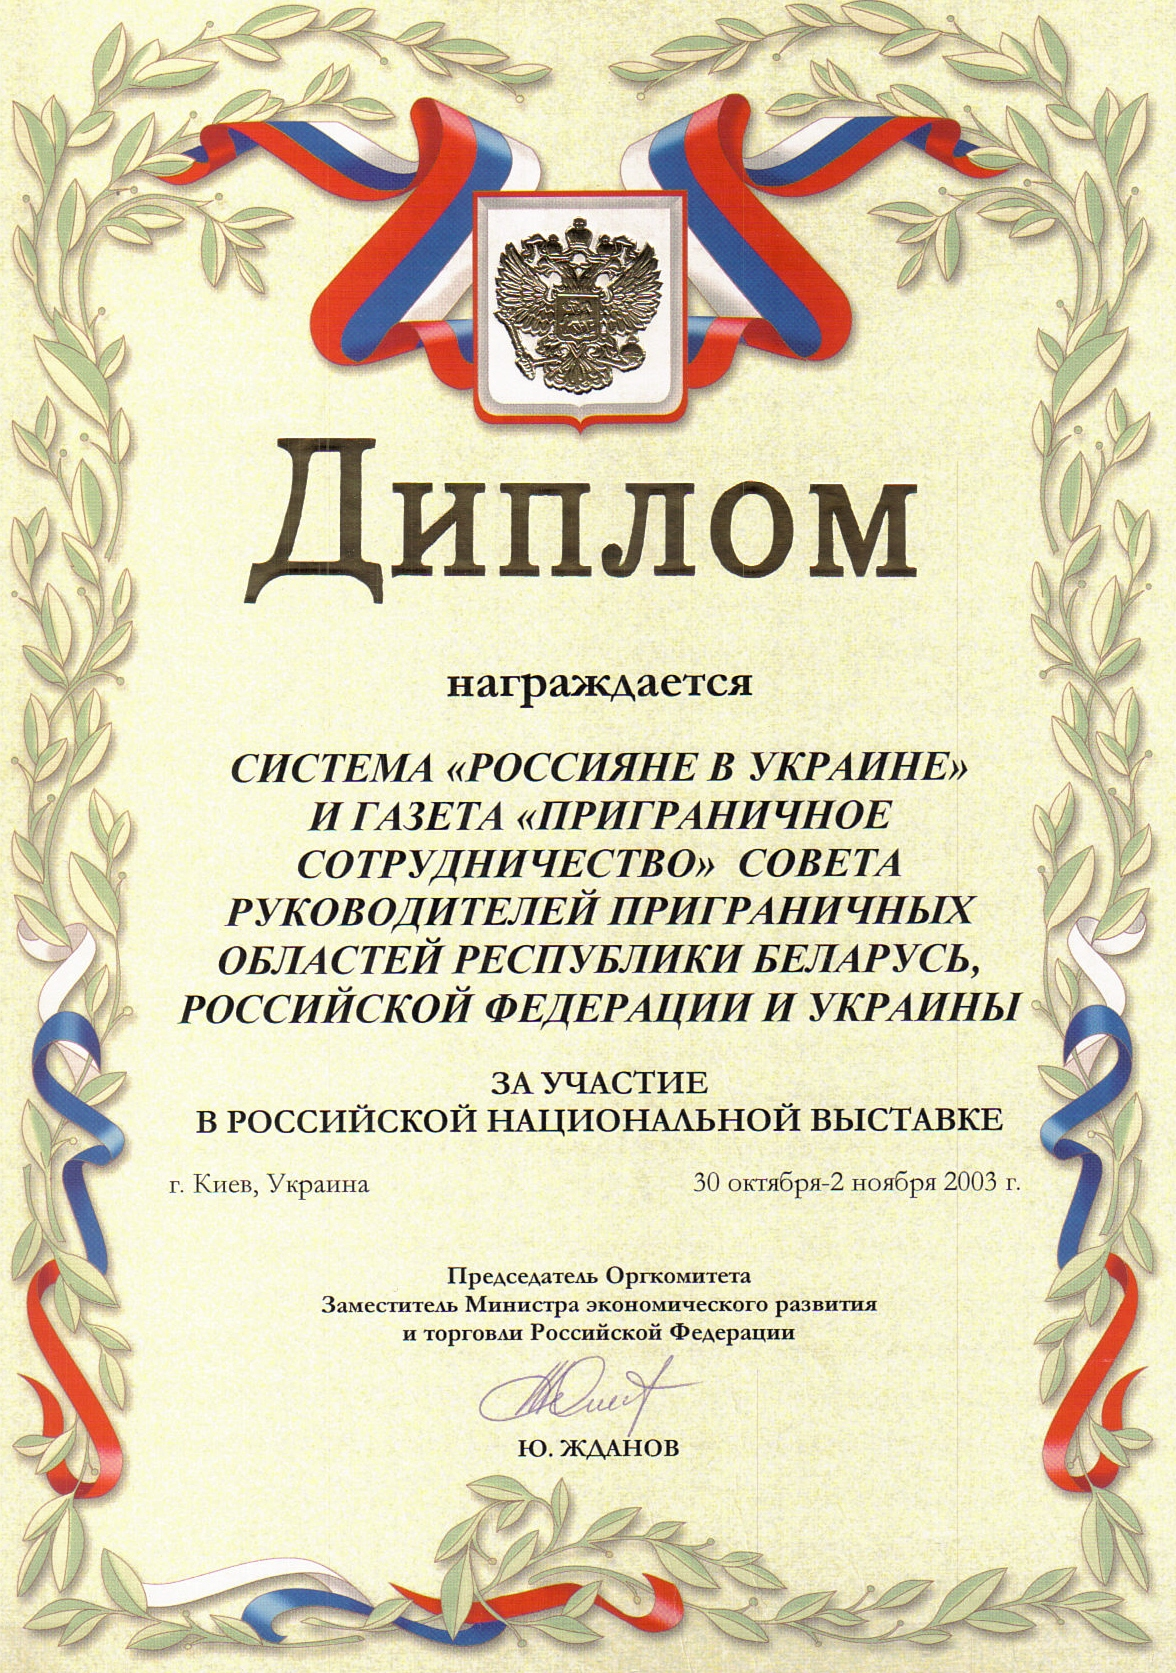 http://rossiane.narod.ru/diplomRvU.jpg